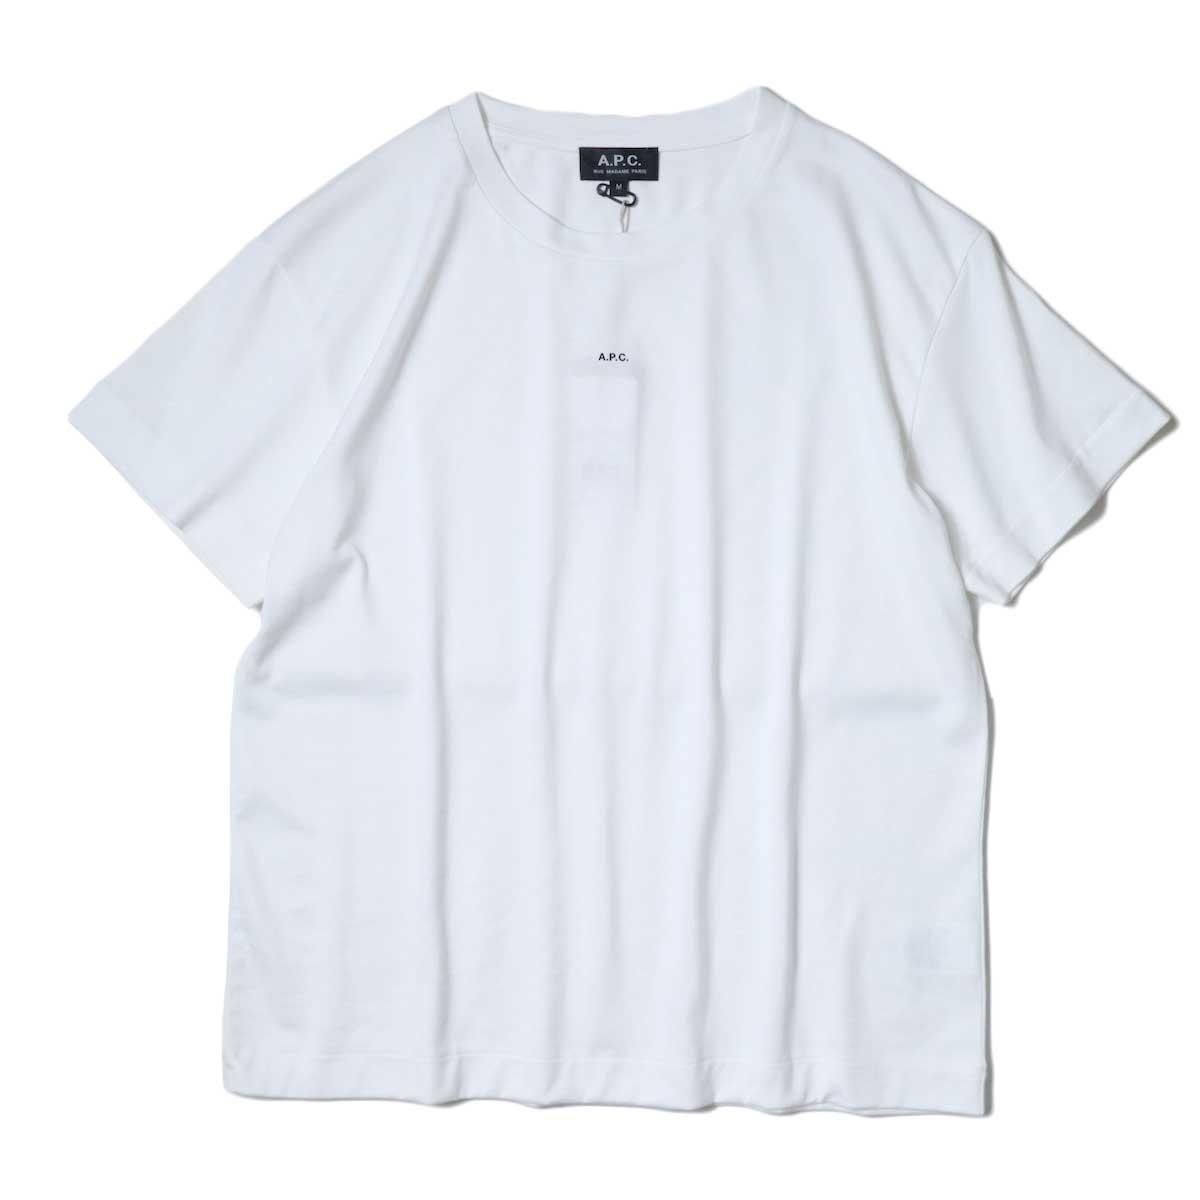 A.P.C. / Jade Tシャツ (White) 正面